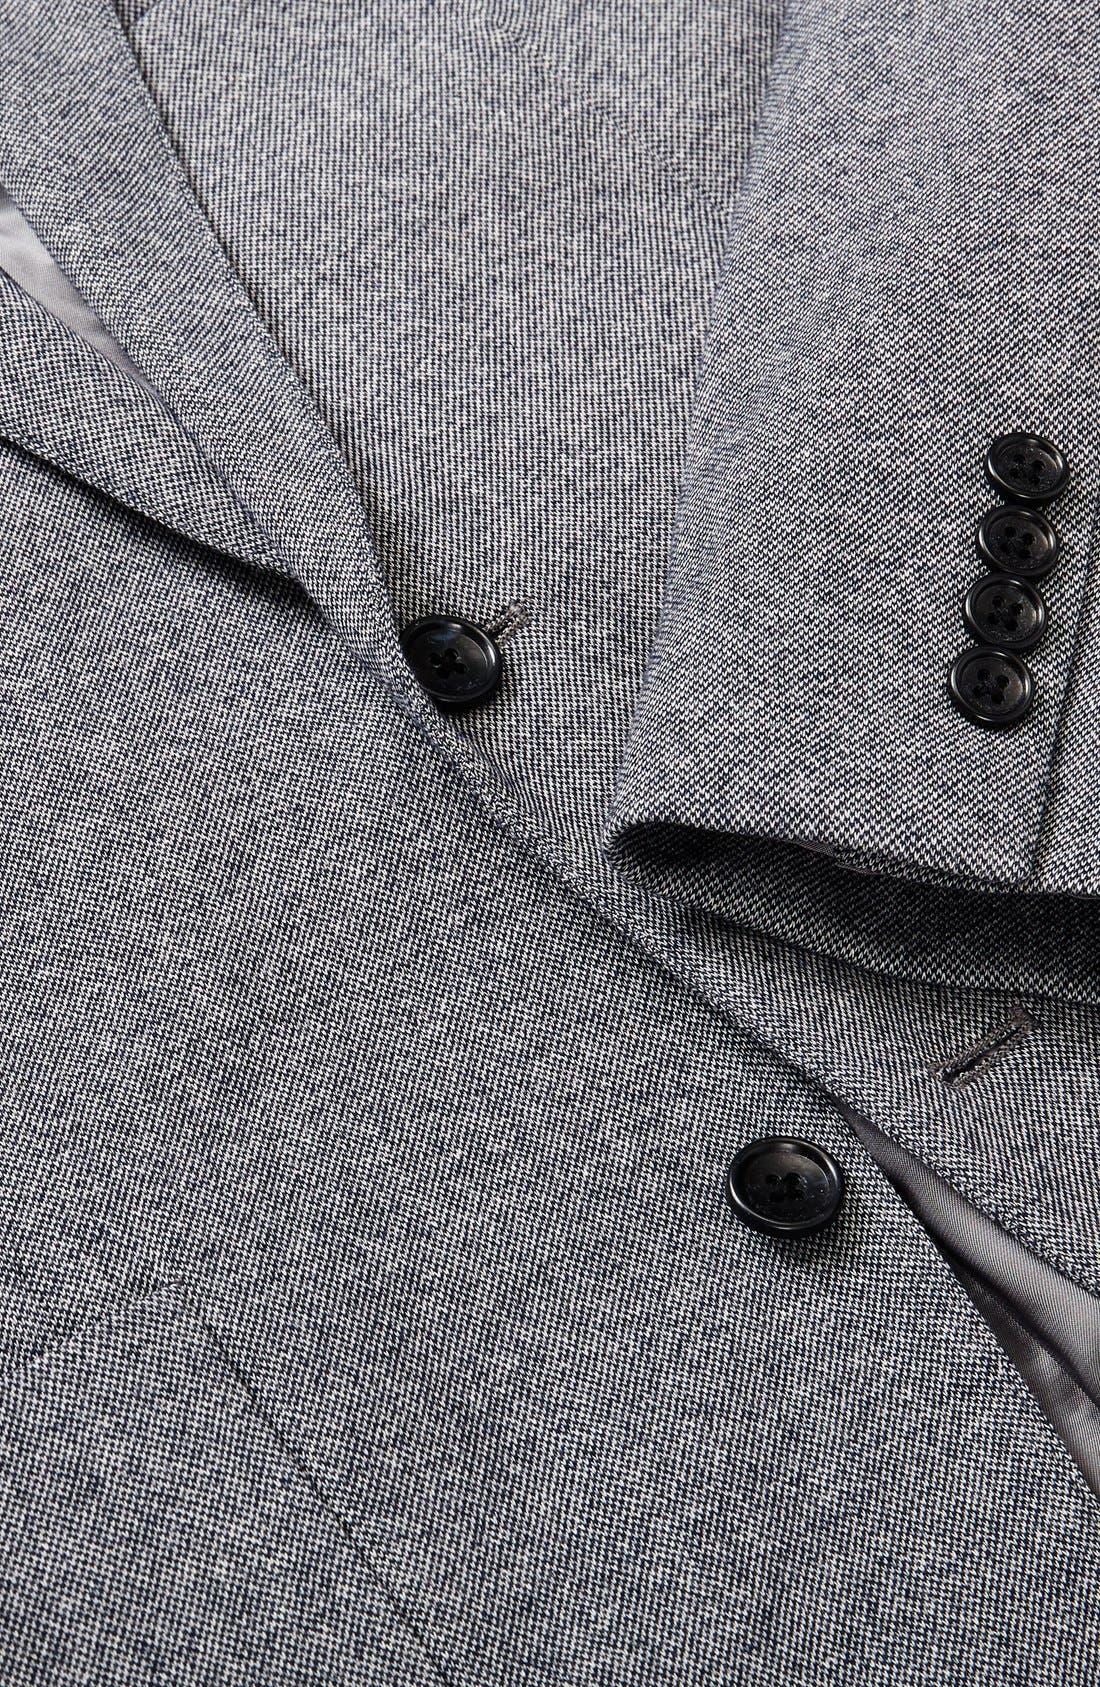 Jetsetter Trim Fit Knit Cotton Blazer,                             Alternate thumbnail 3, color,                             Light Grey